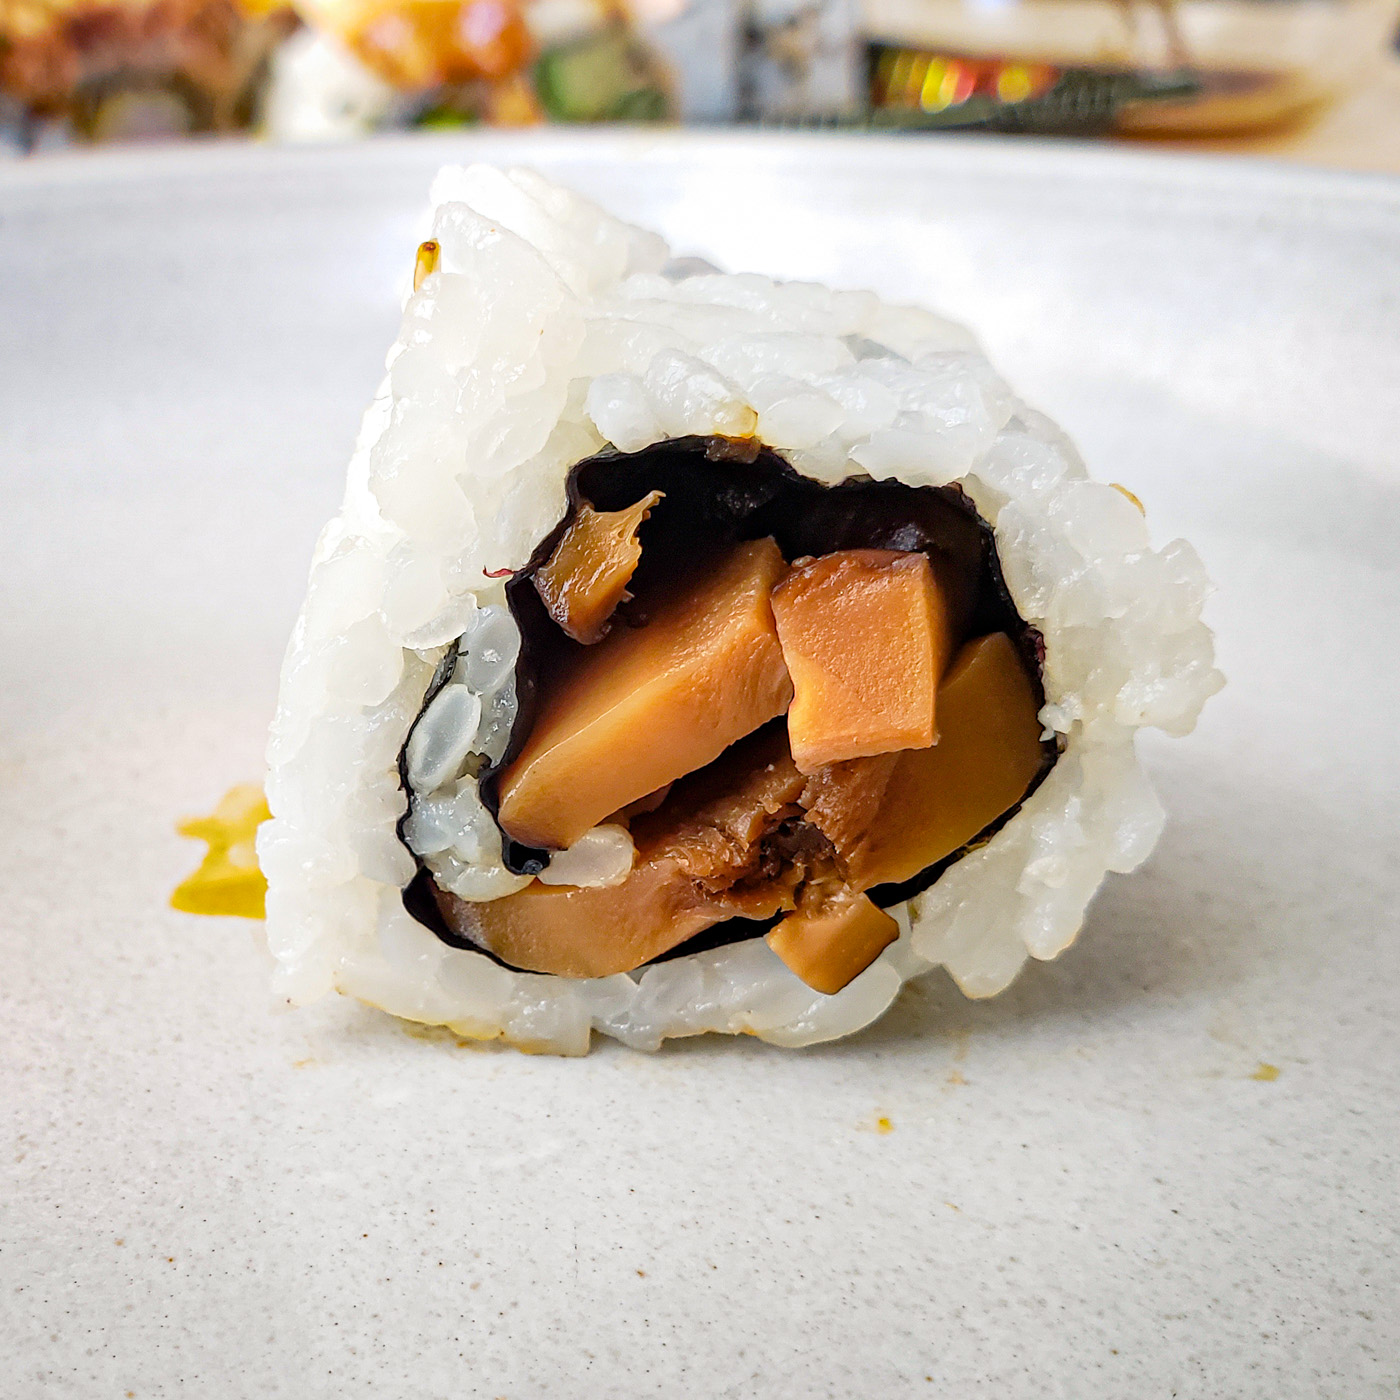 Shiitake Mushroom Roll from Tomo Suhsi and Ramen